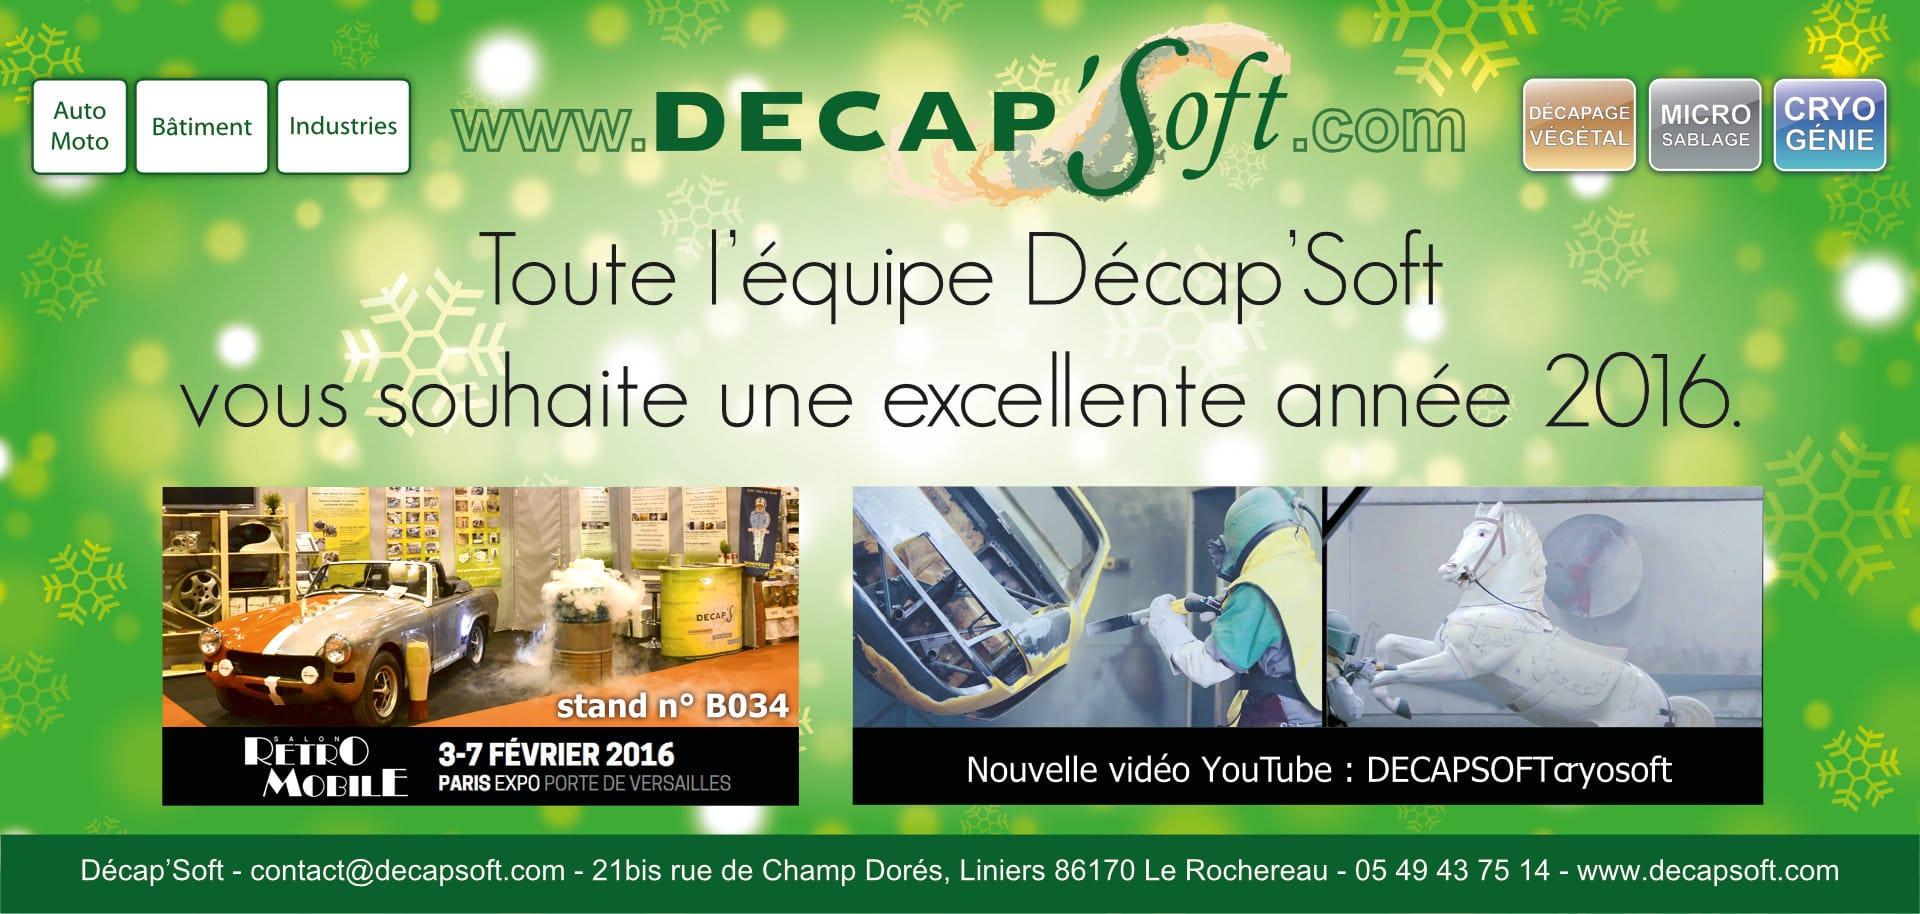 Decapu0027Soft